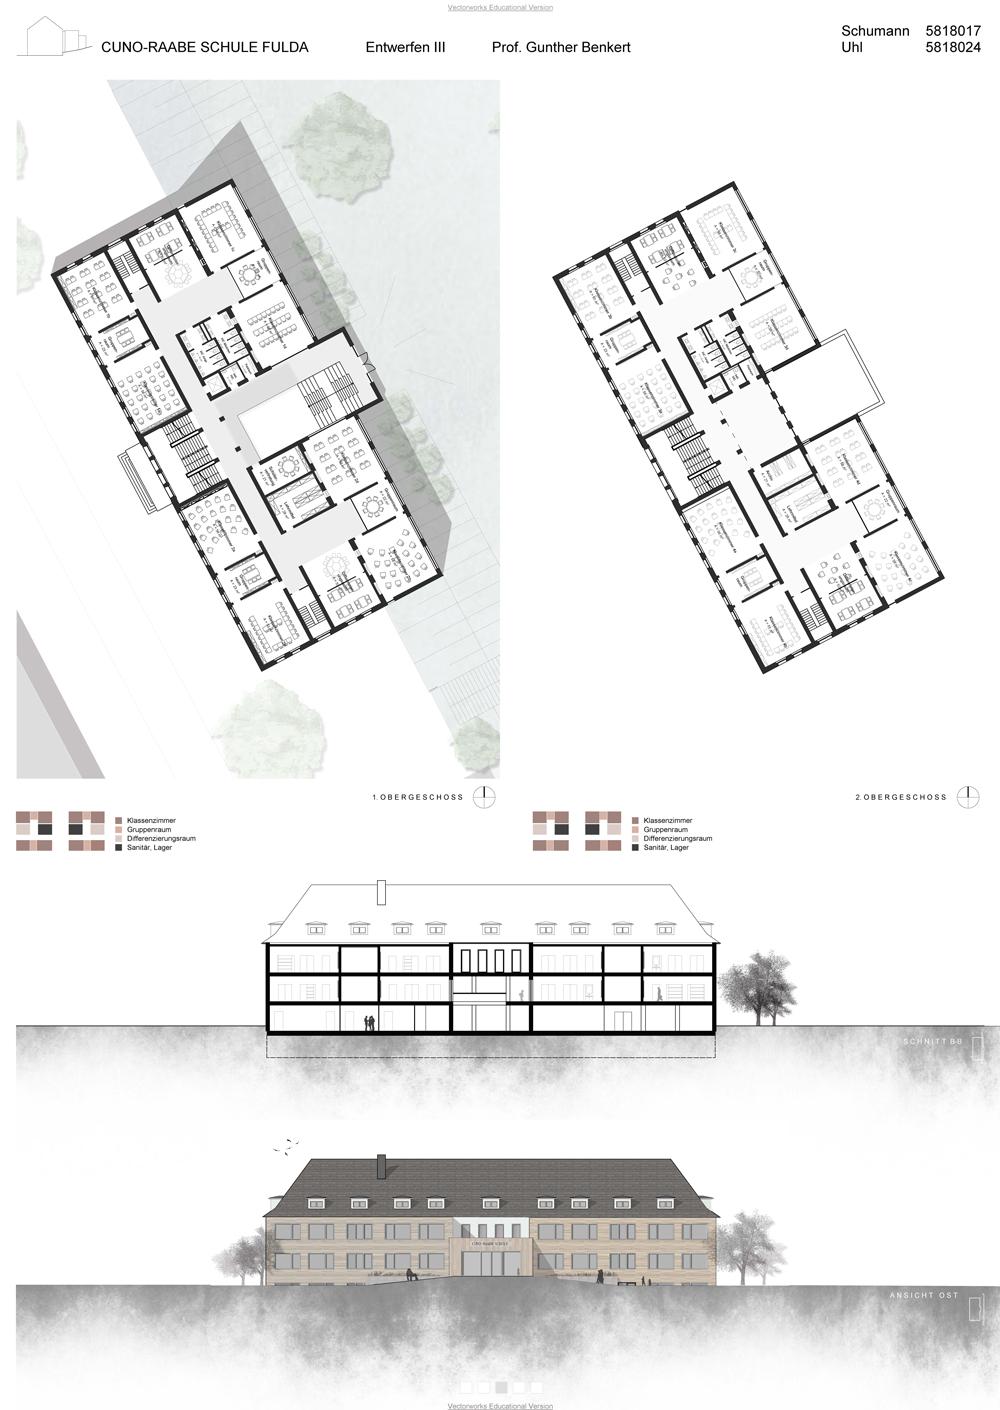 Schumann_Uhl_Plan2